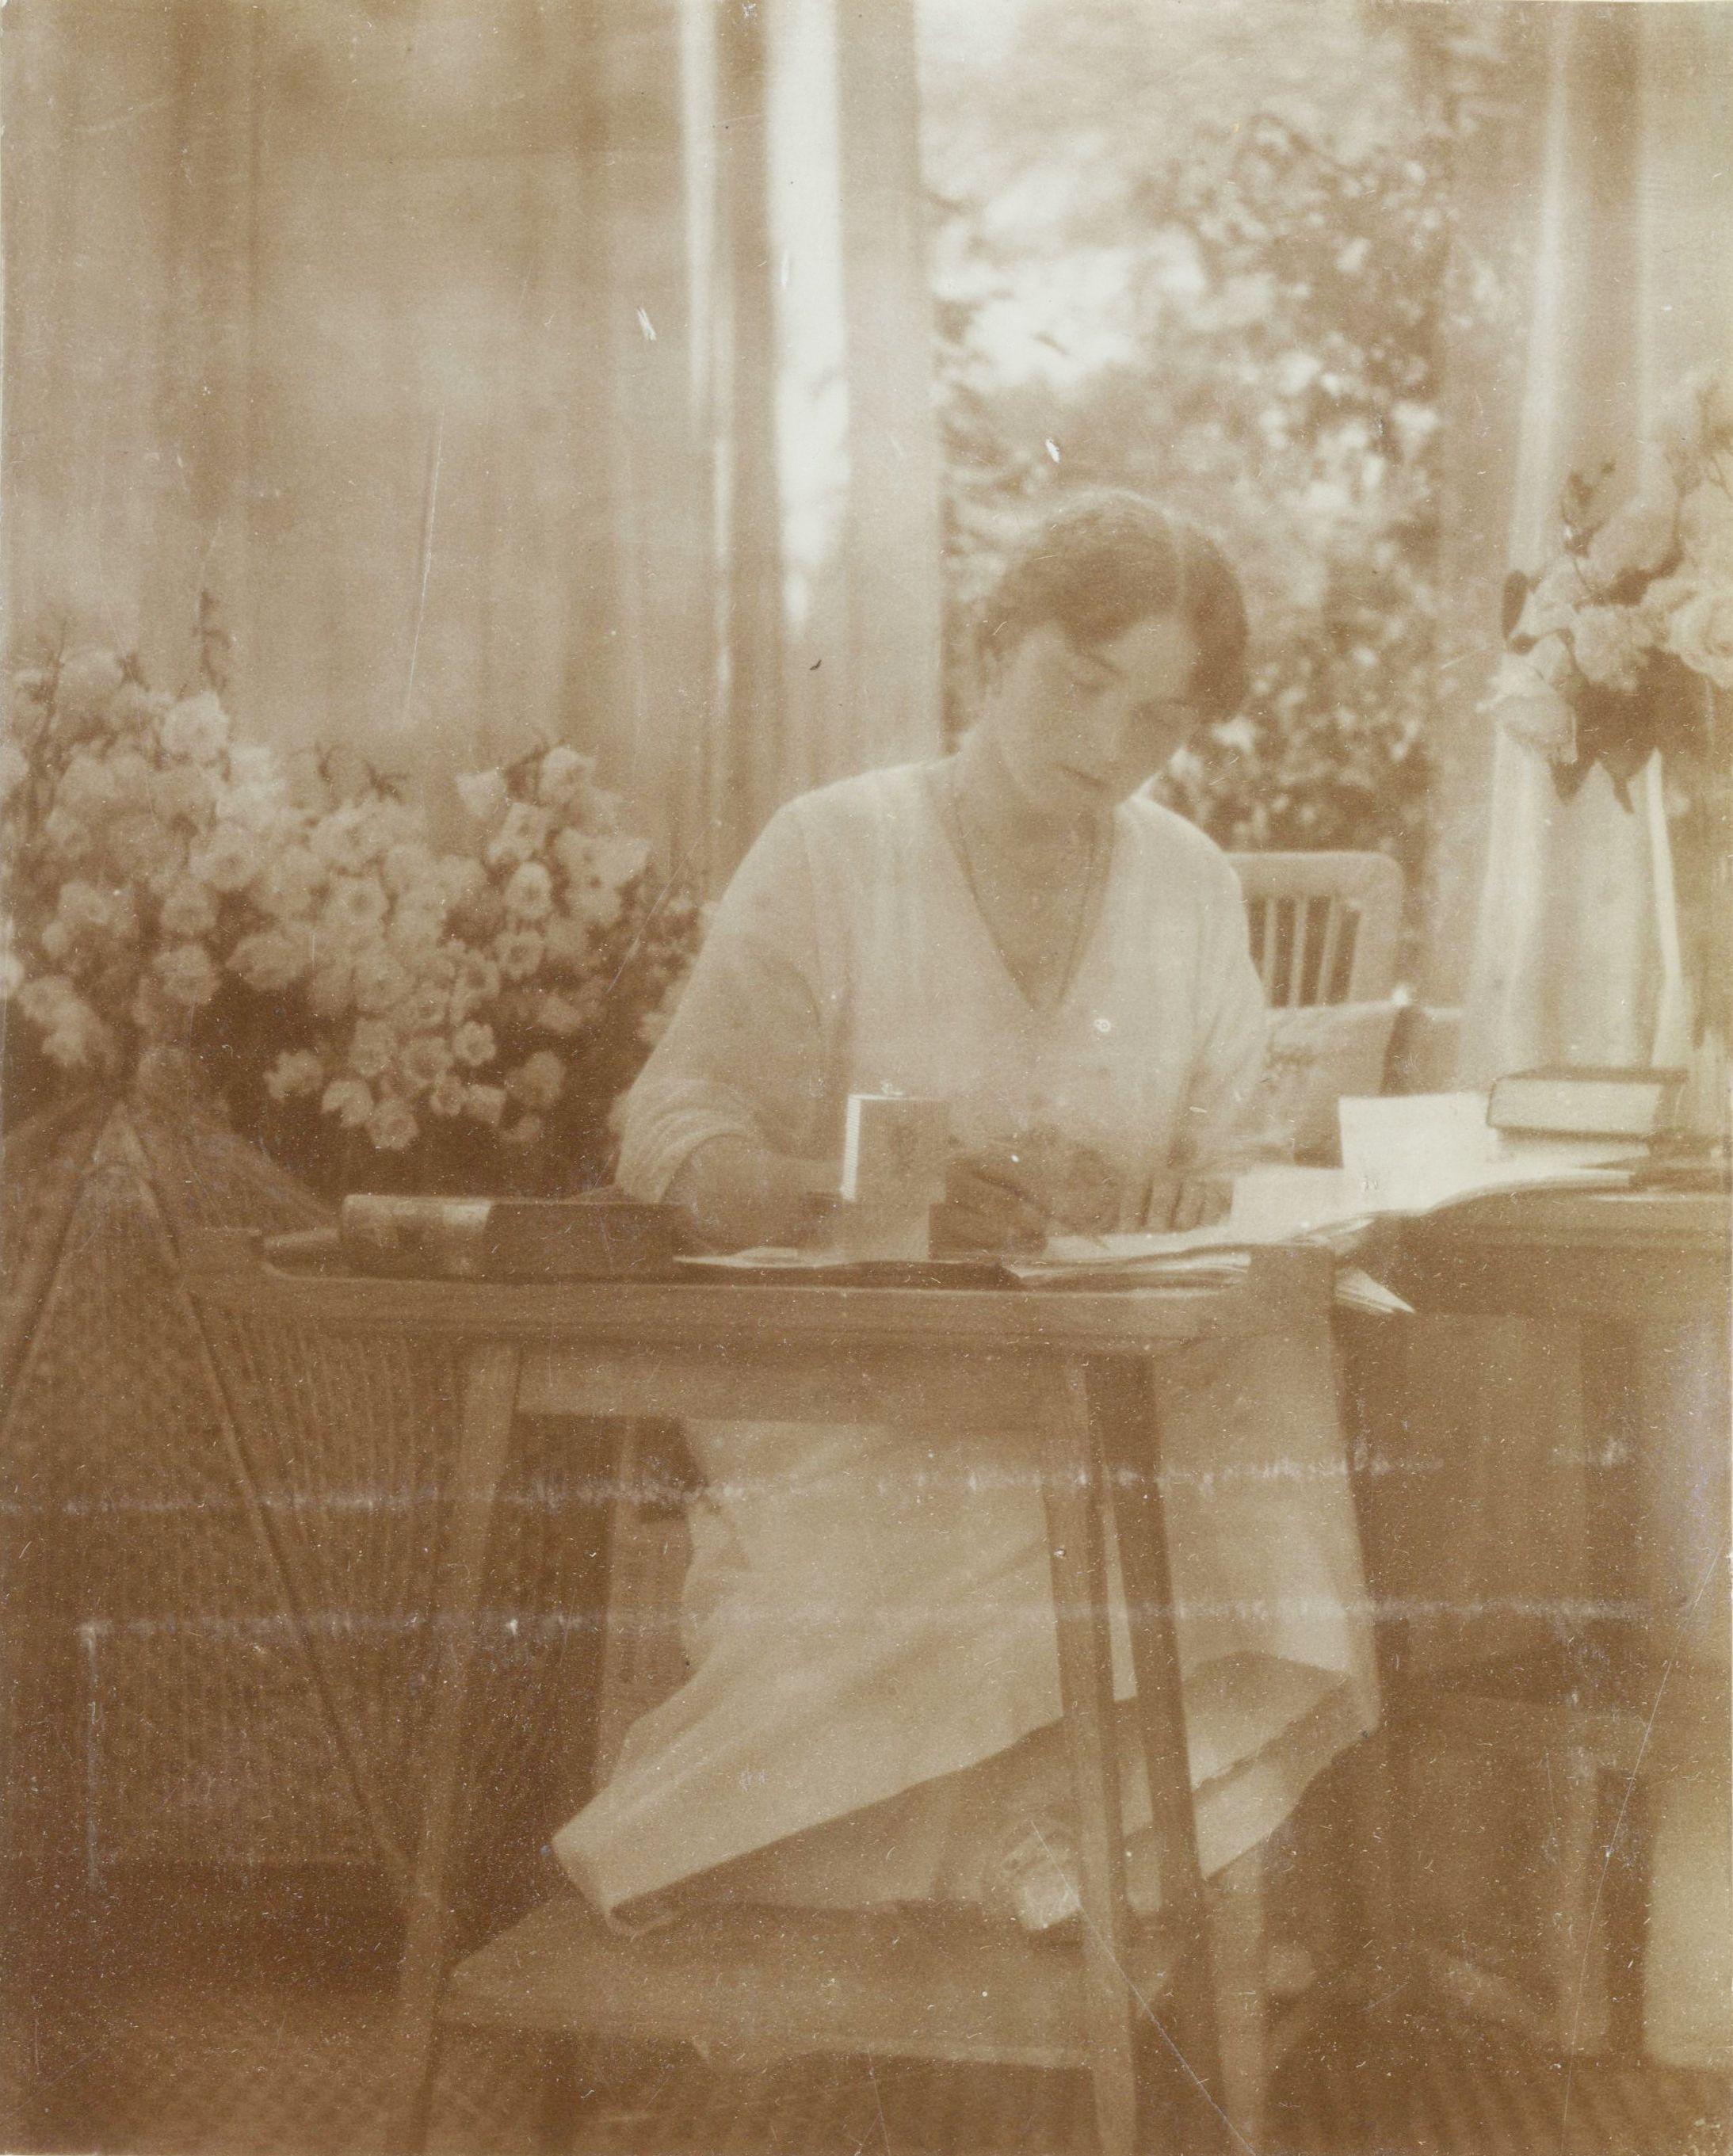 Olga at Tsarskoye Selo, 1915